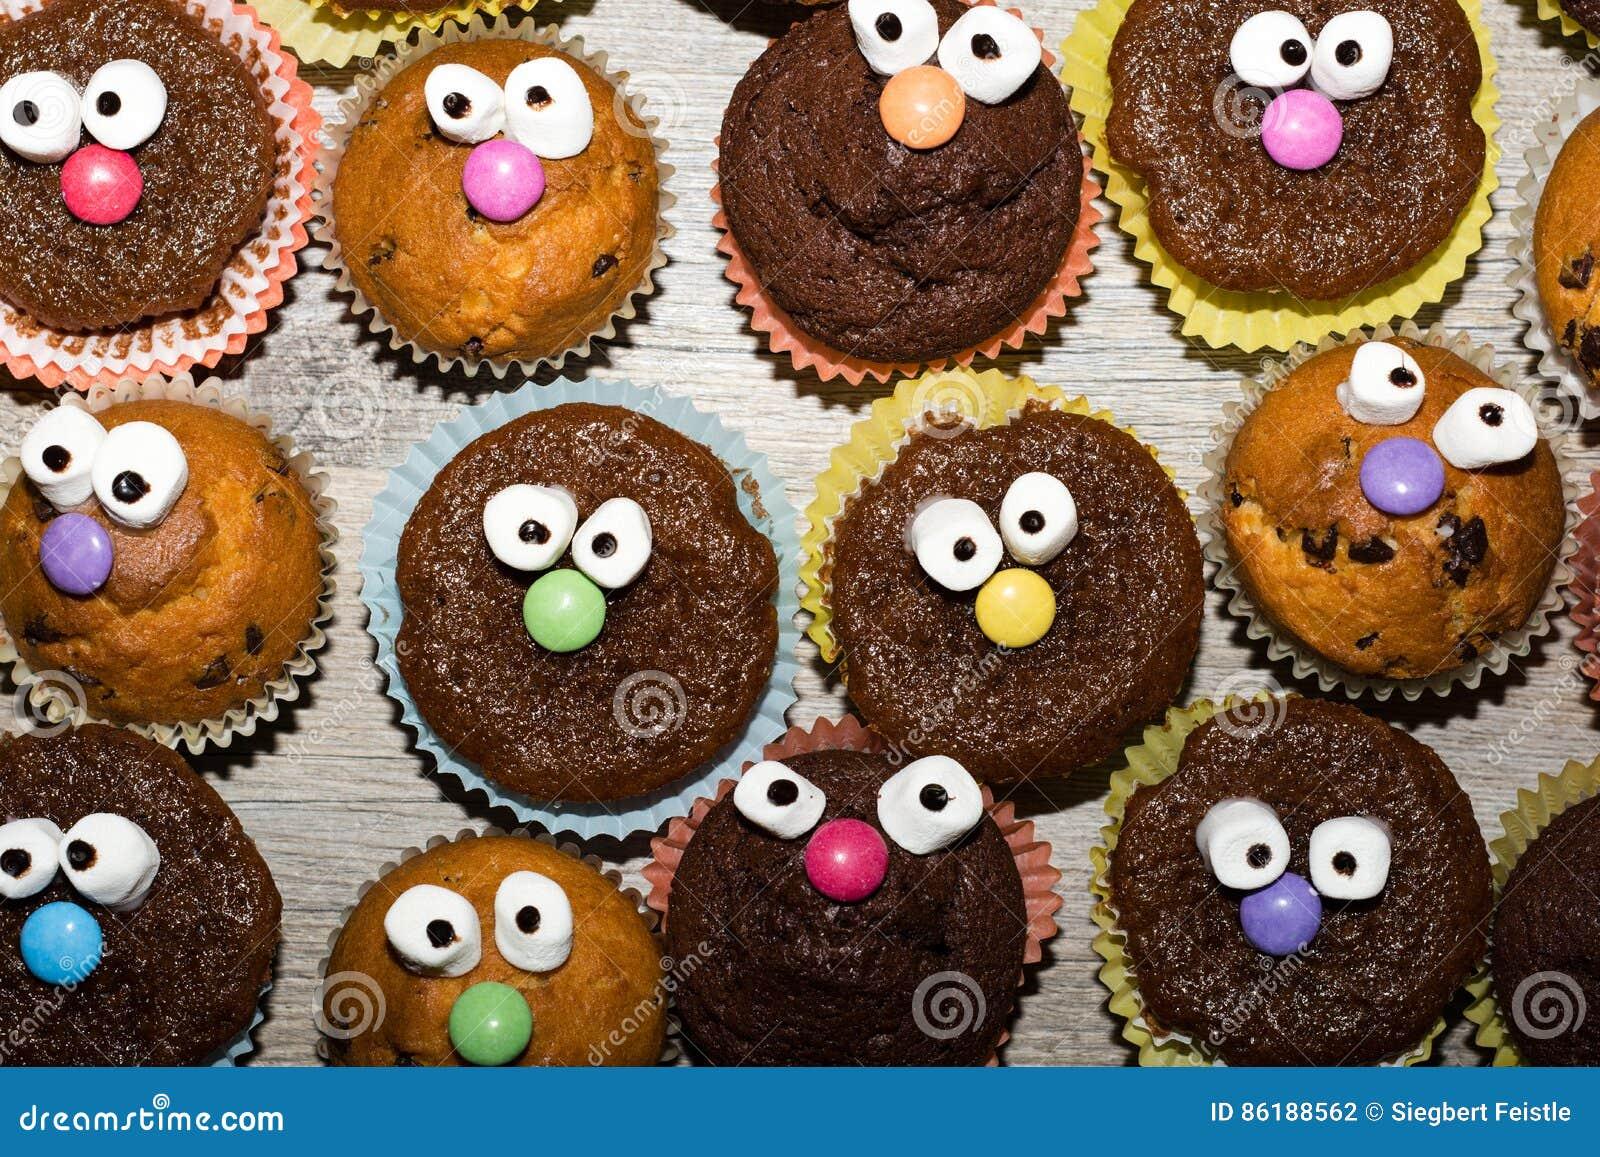 grappige muffins met gezicht stock foto afbeelding. Black Bedroom Furniture Sets. Home Design Ideas